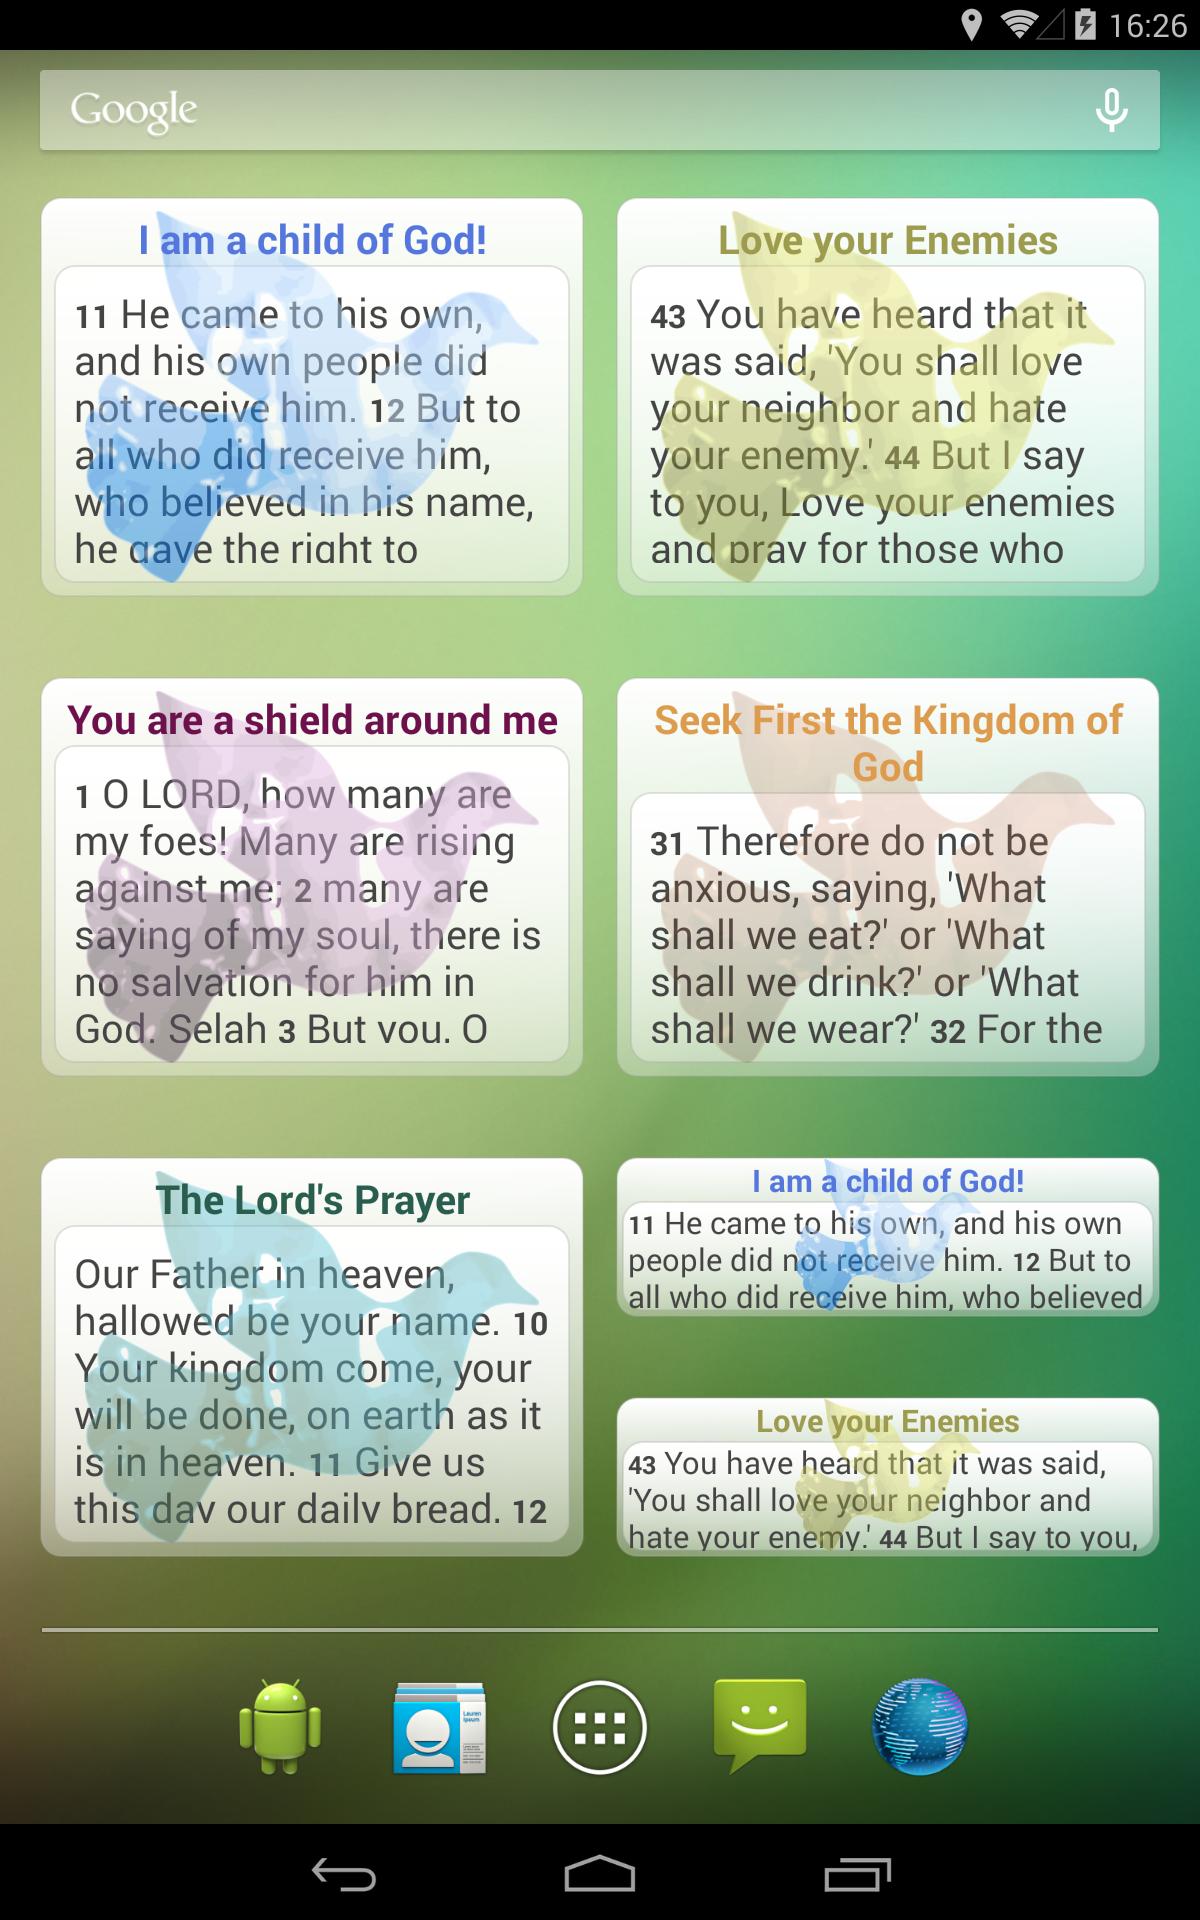 Inspiring Famous Quotes Daily screenshot #9